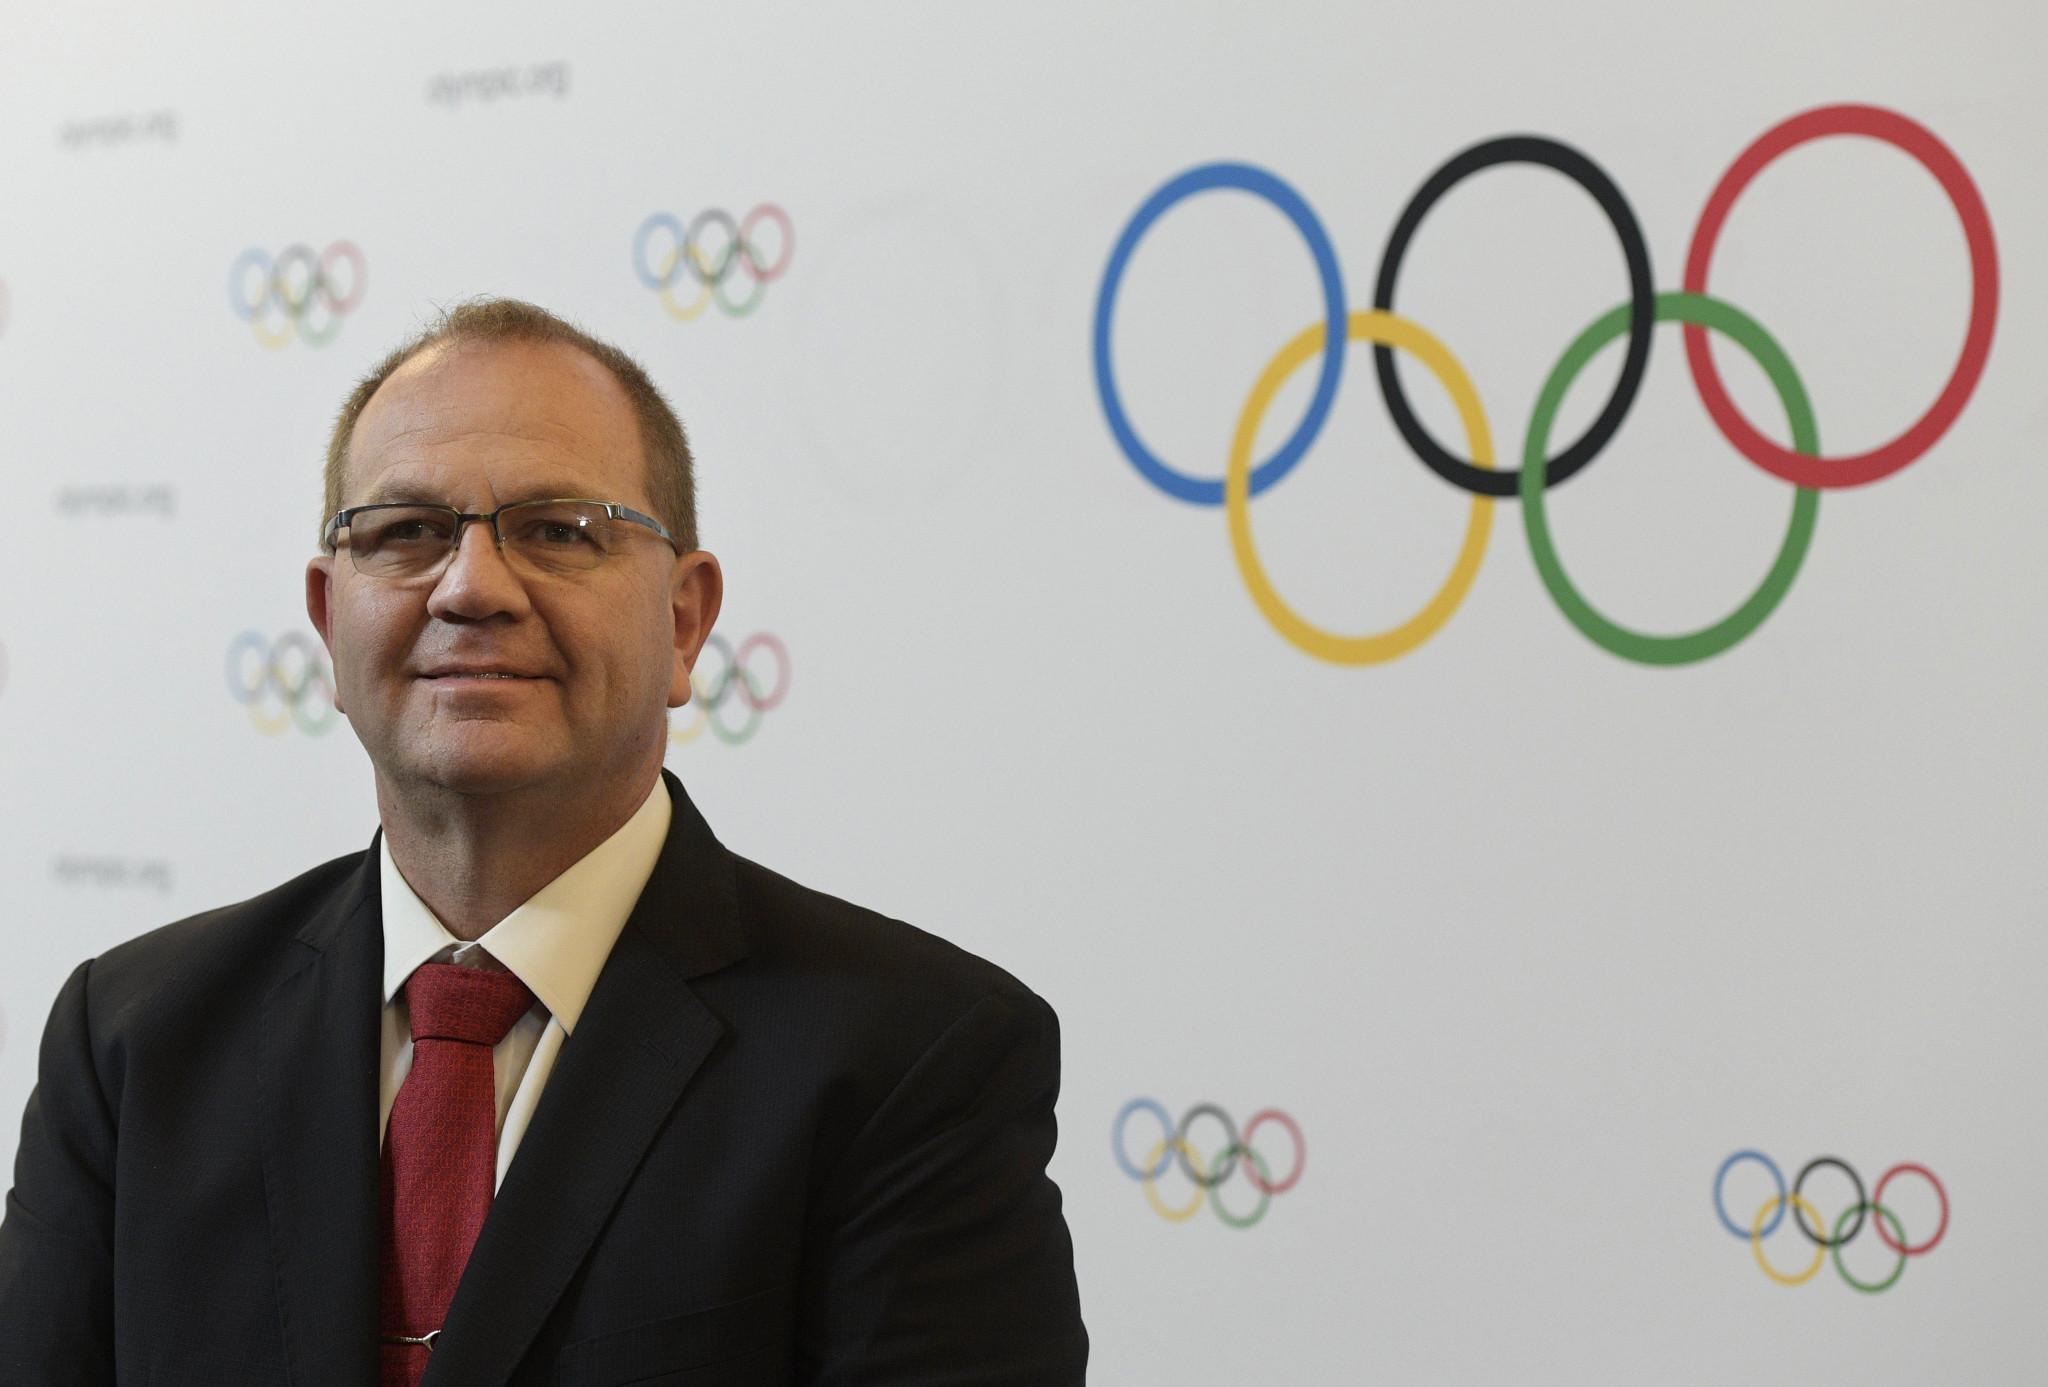 ODESUR pledges to help NOCs prepare for postponed Tokyo 2020 Olympics